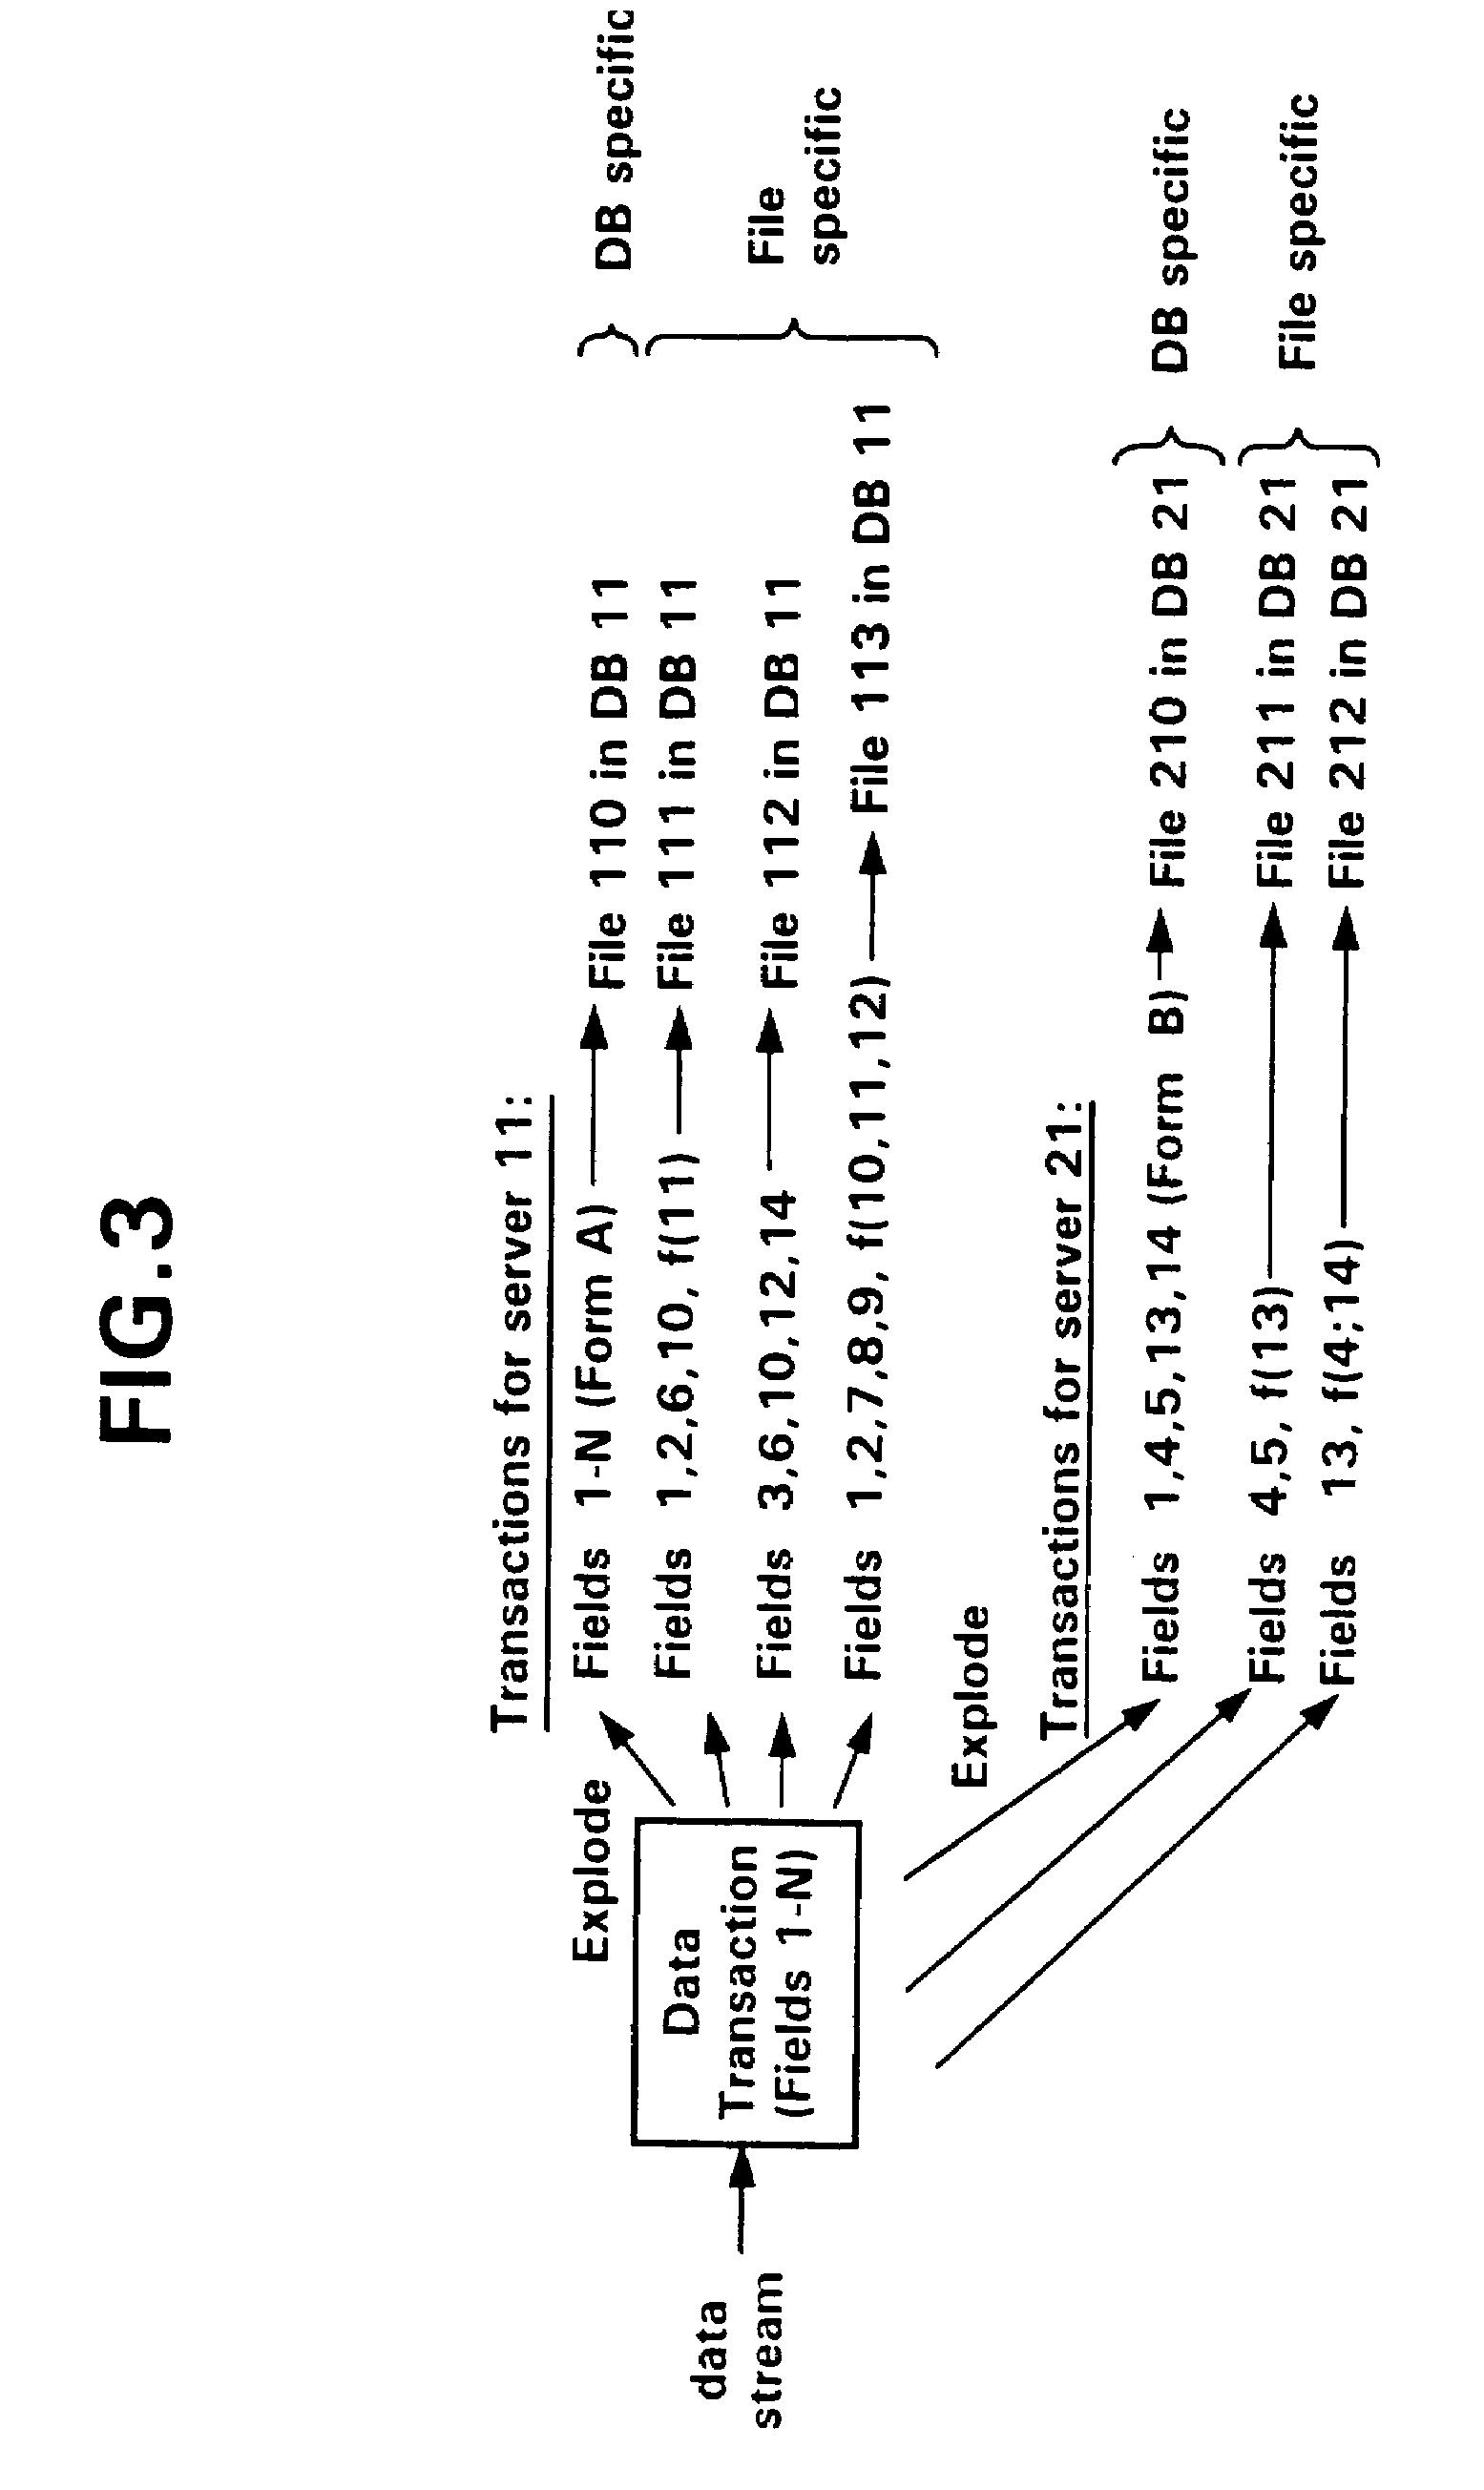 Patent US 7,334,024 B2